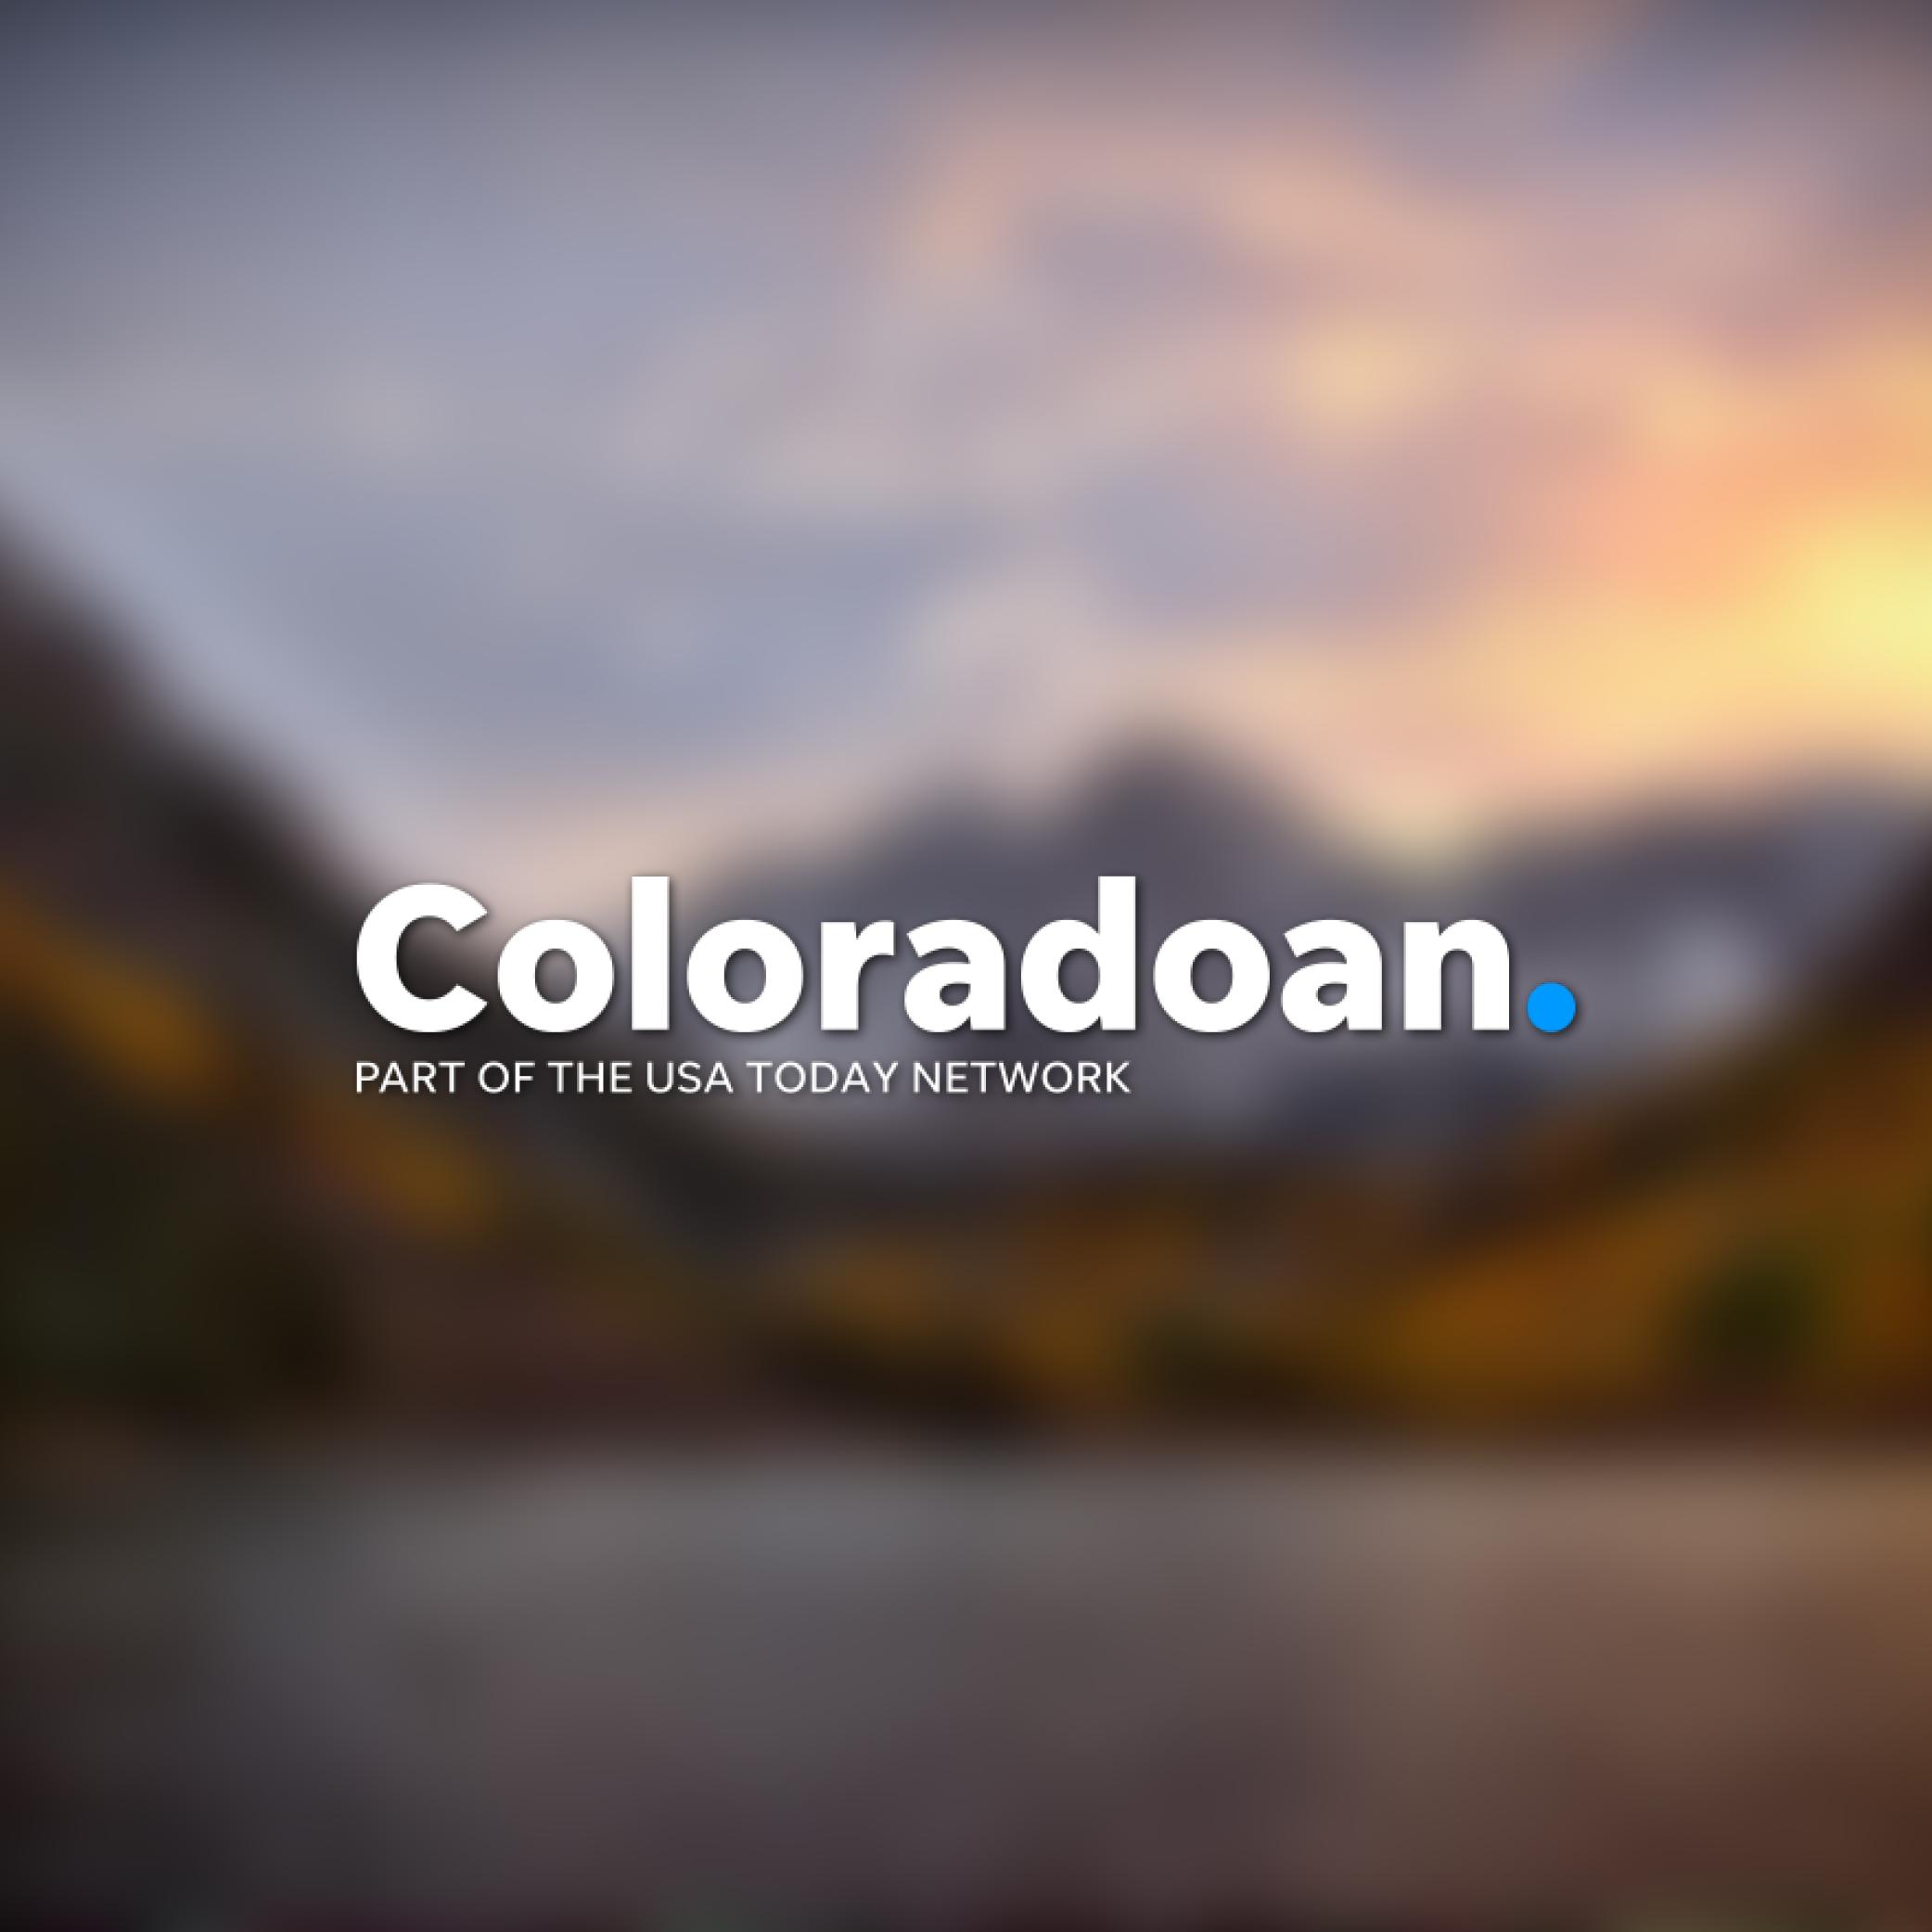 The Coloradoan